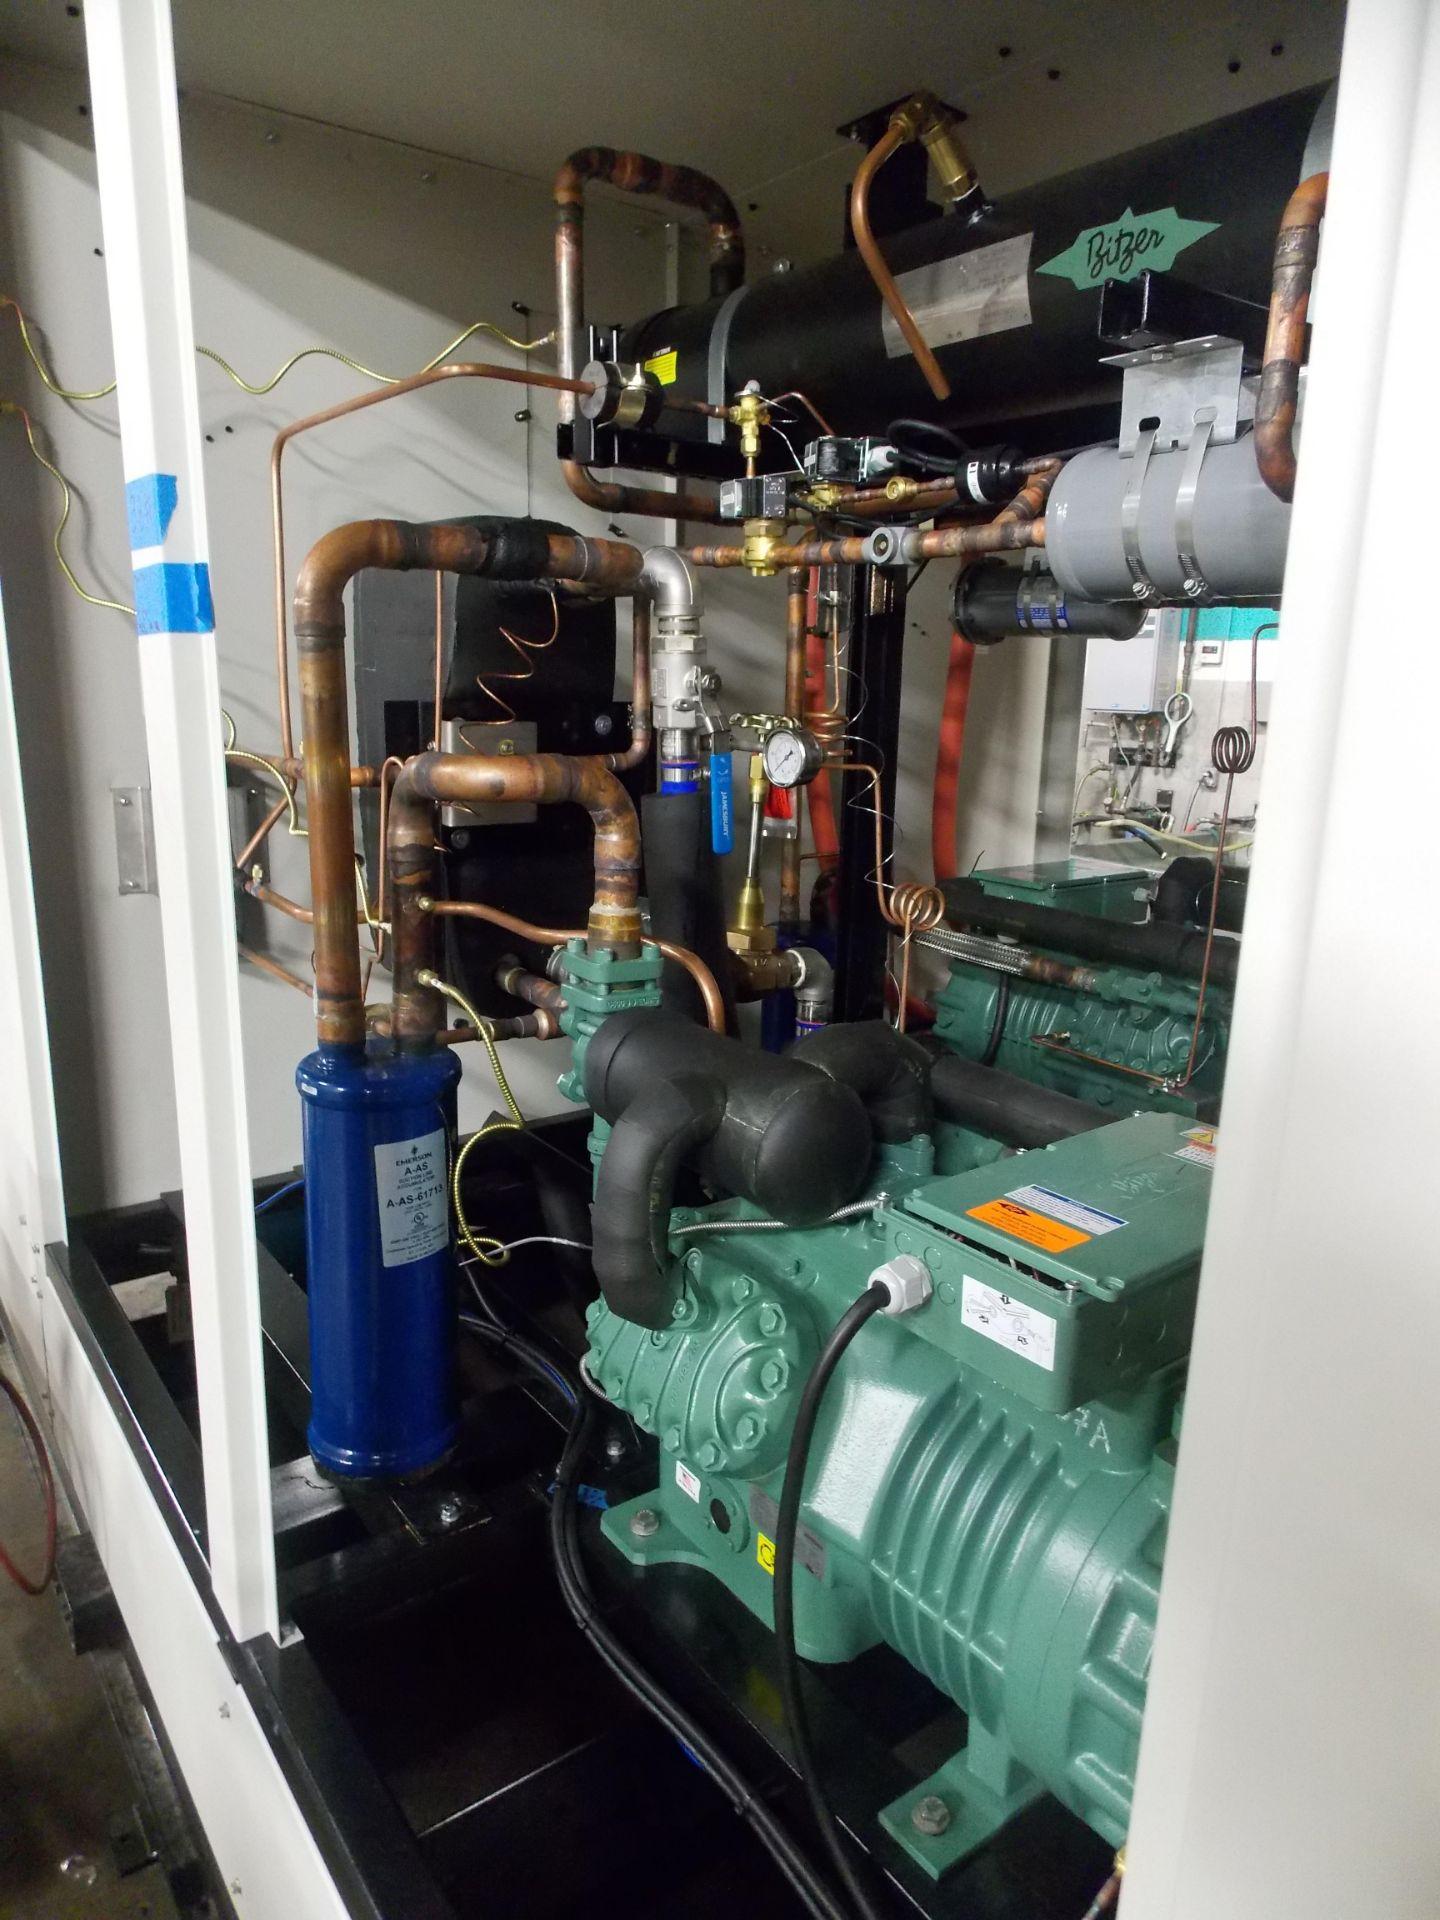 Unused-Fluid Chillers Inc -40 C Water-Cooled Fluid Chiller. Model WAT50,000-DC-ULT-RS. Cap: 42.4 kW - Image 3 of 7